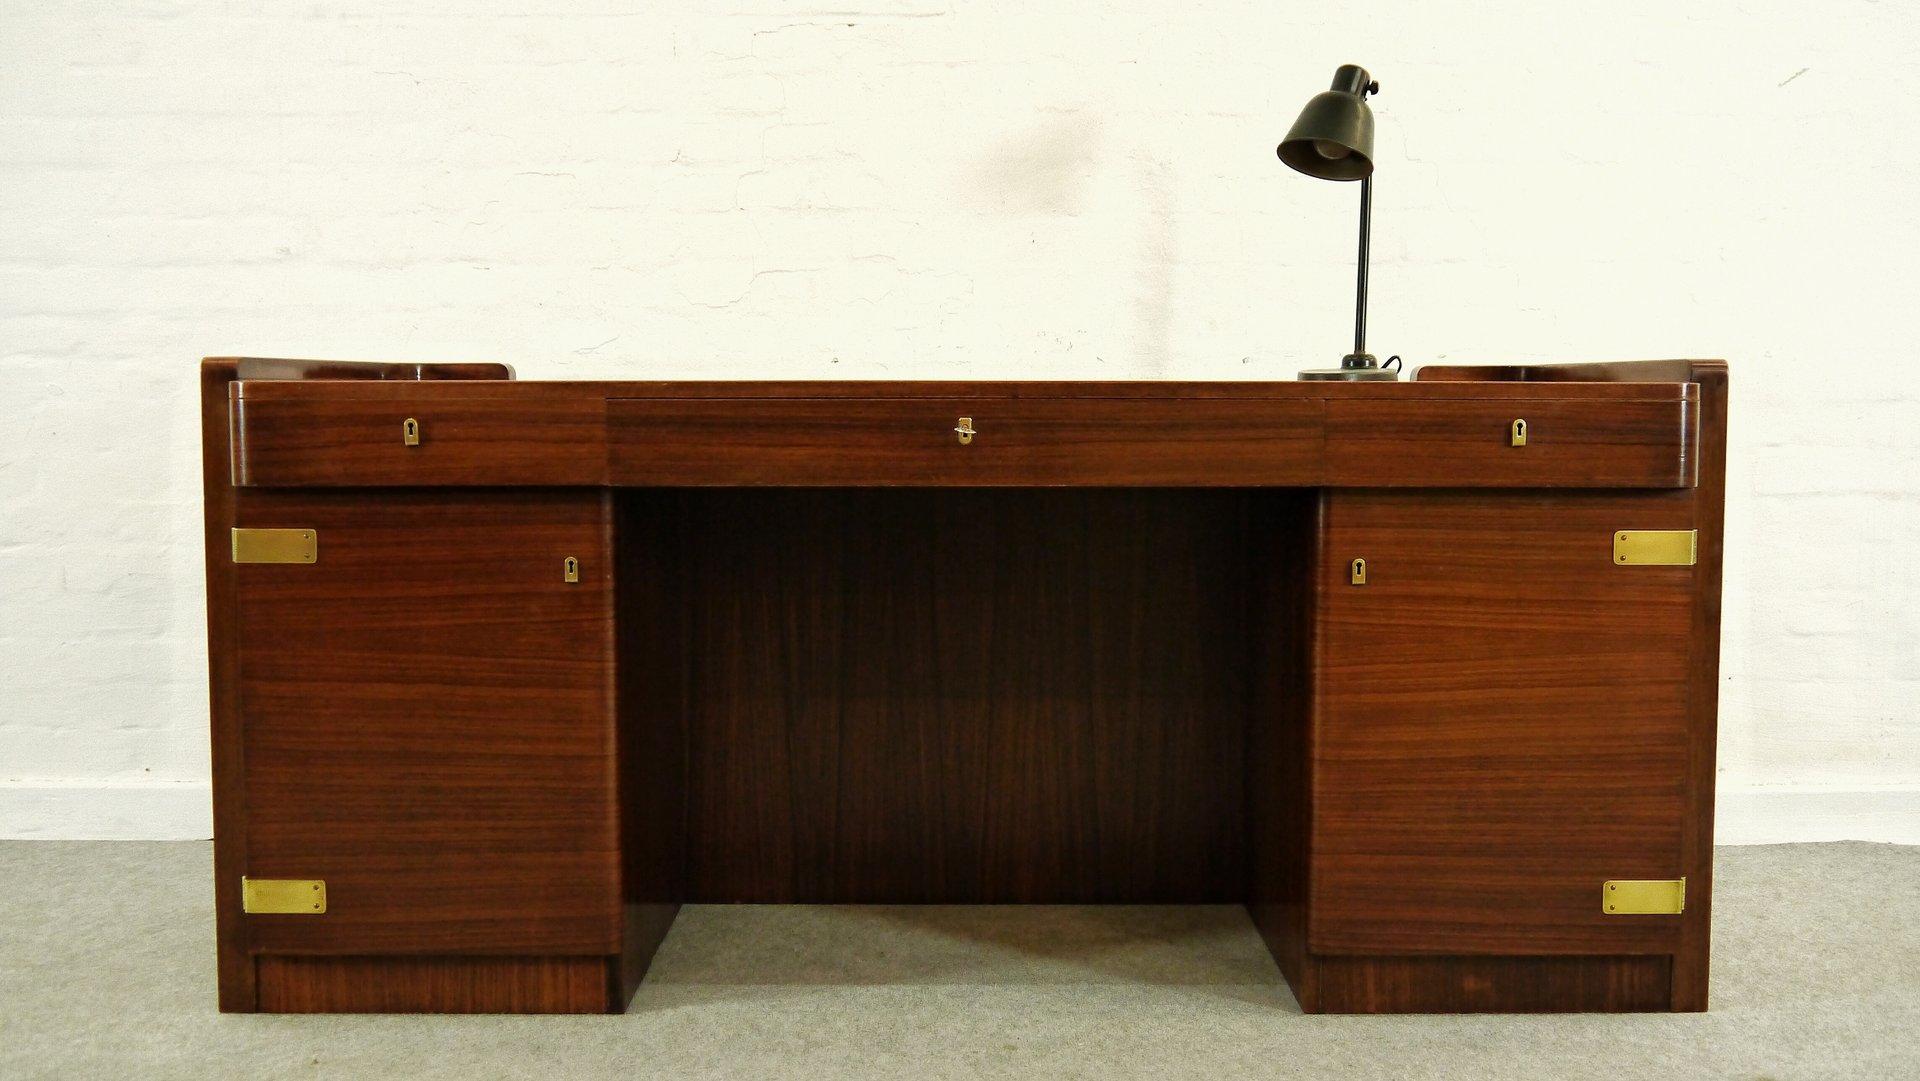 bauhaus art deco desk by bruno paul for wk m bel 1930s for sale at pamono. Black Bedroom Furniture Sets. Home Design Ideas